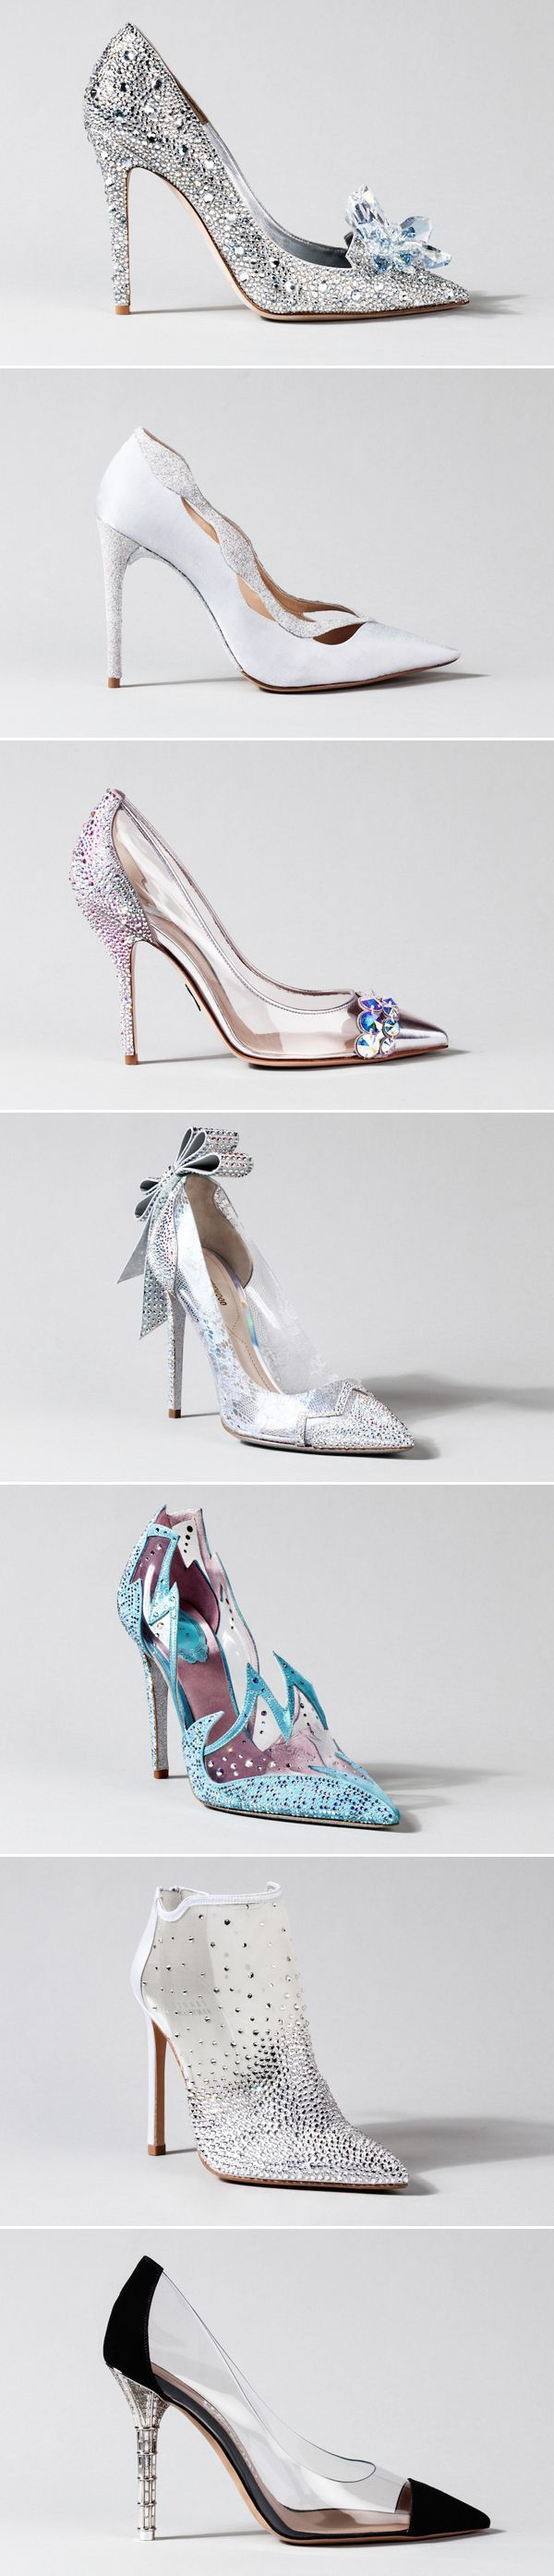 15 Stunning Cinderella-Inspired Wedding Shoes - The Glass Slipper Project: Cinderella-Inspired Designer Shoes #weddingshoes